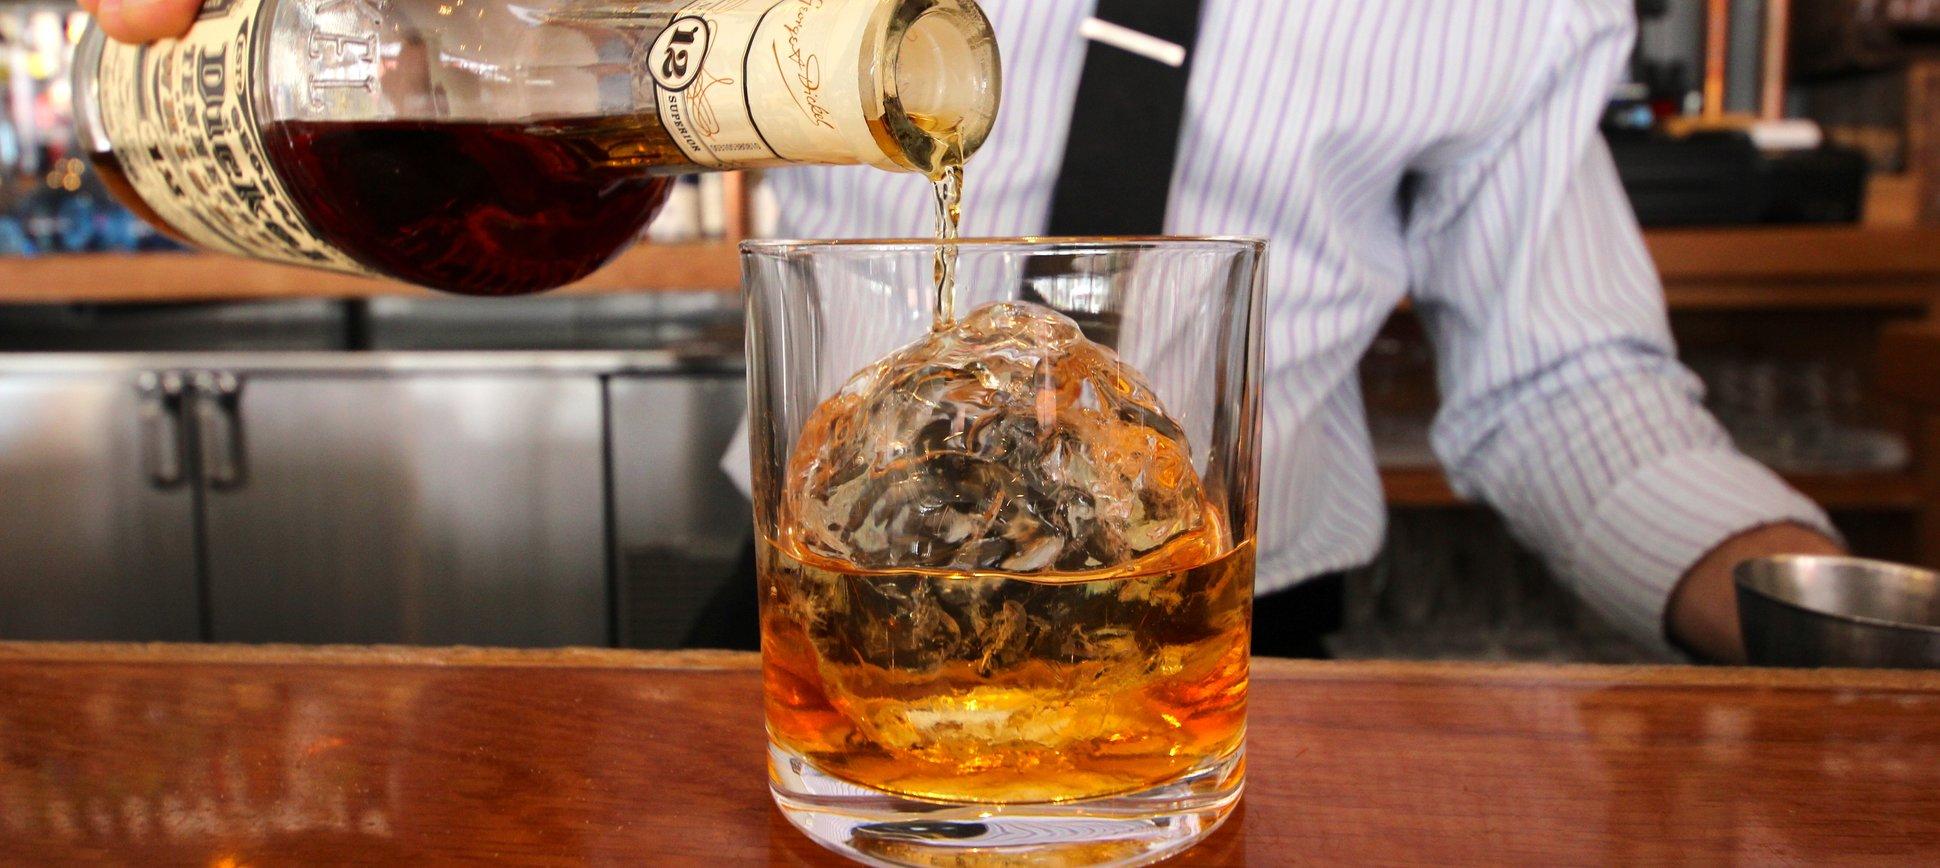 bartender pouring whiskey